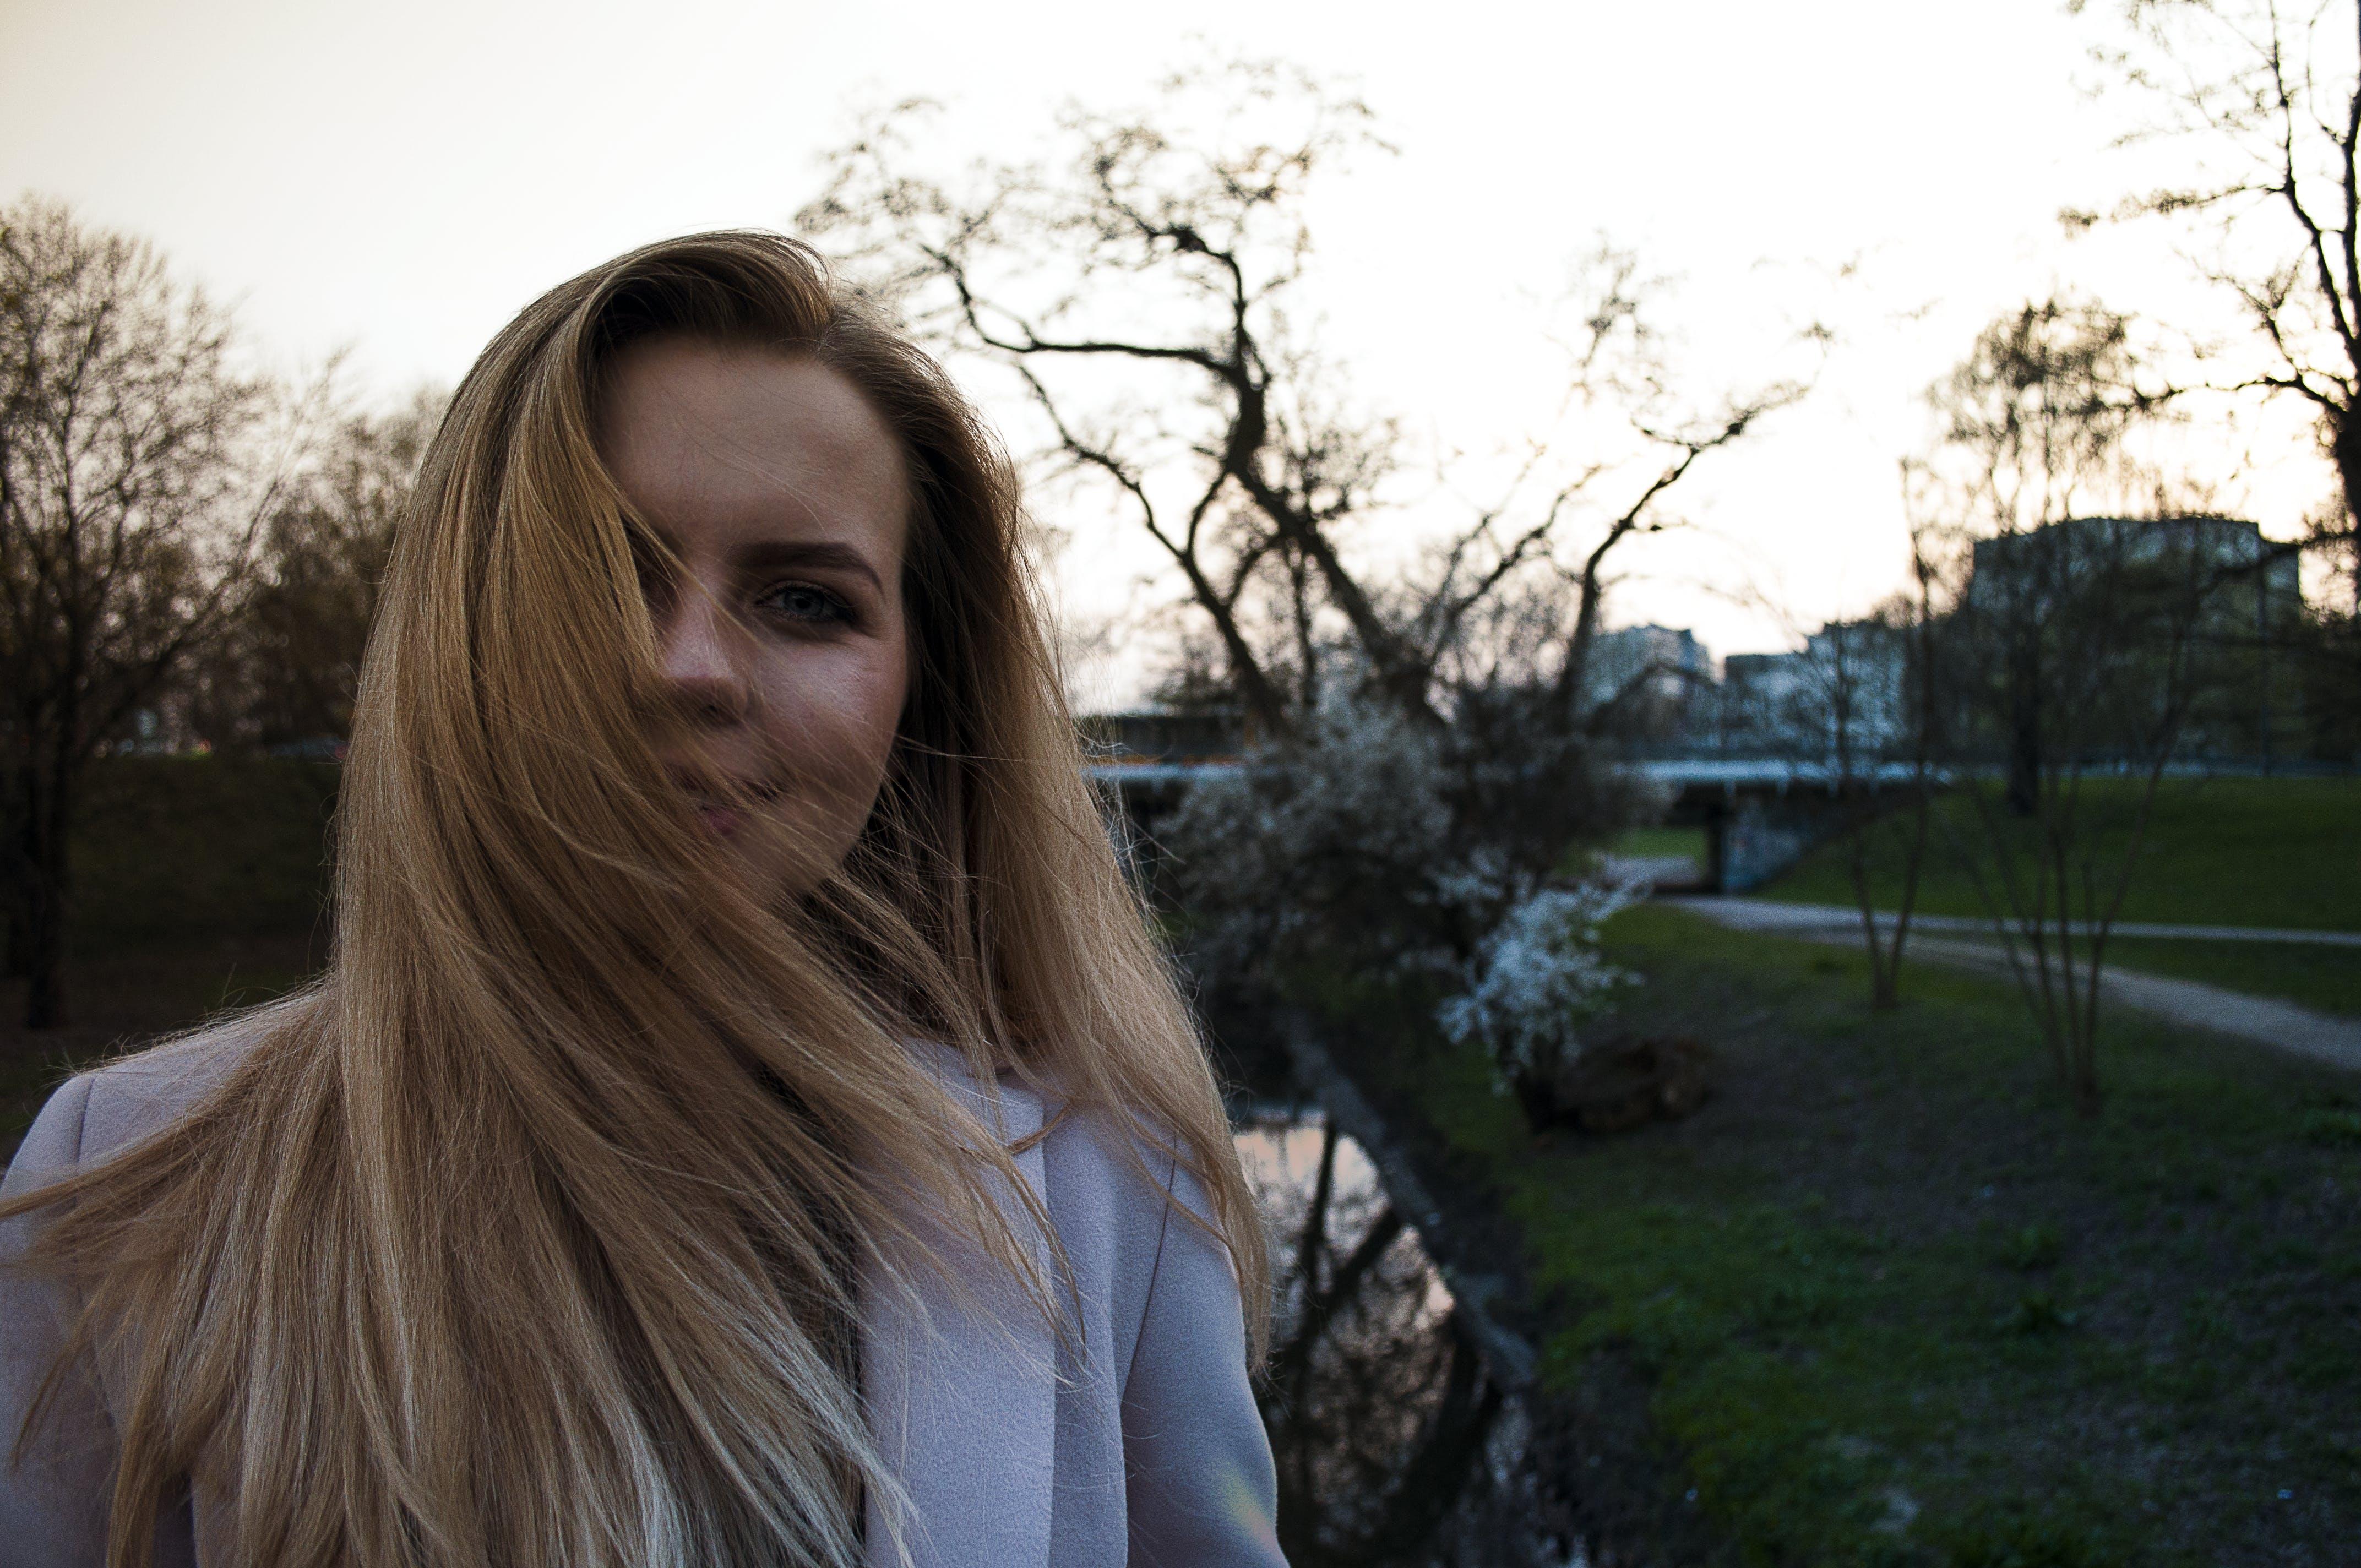 Woman Wearing White Winter Coat While Taking Selfie